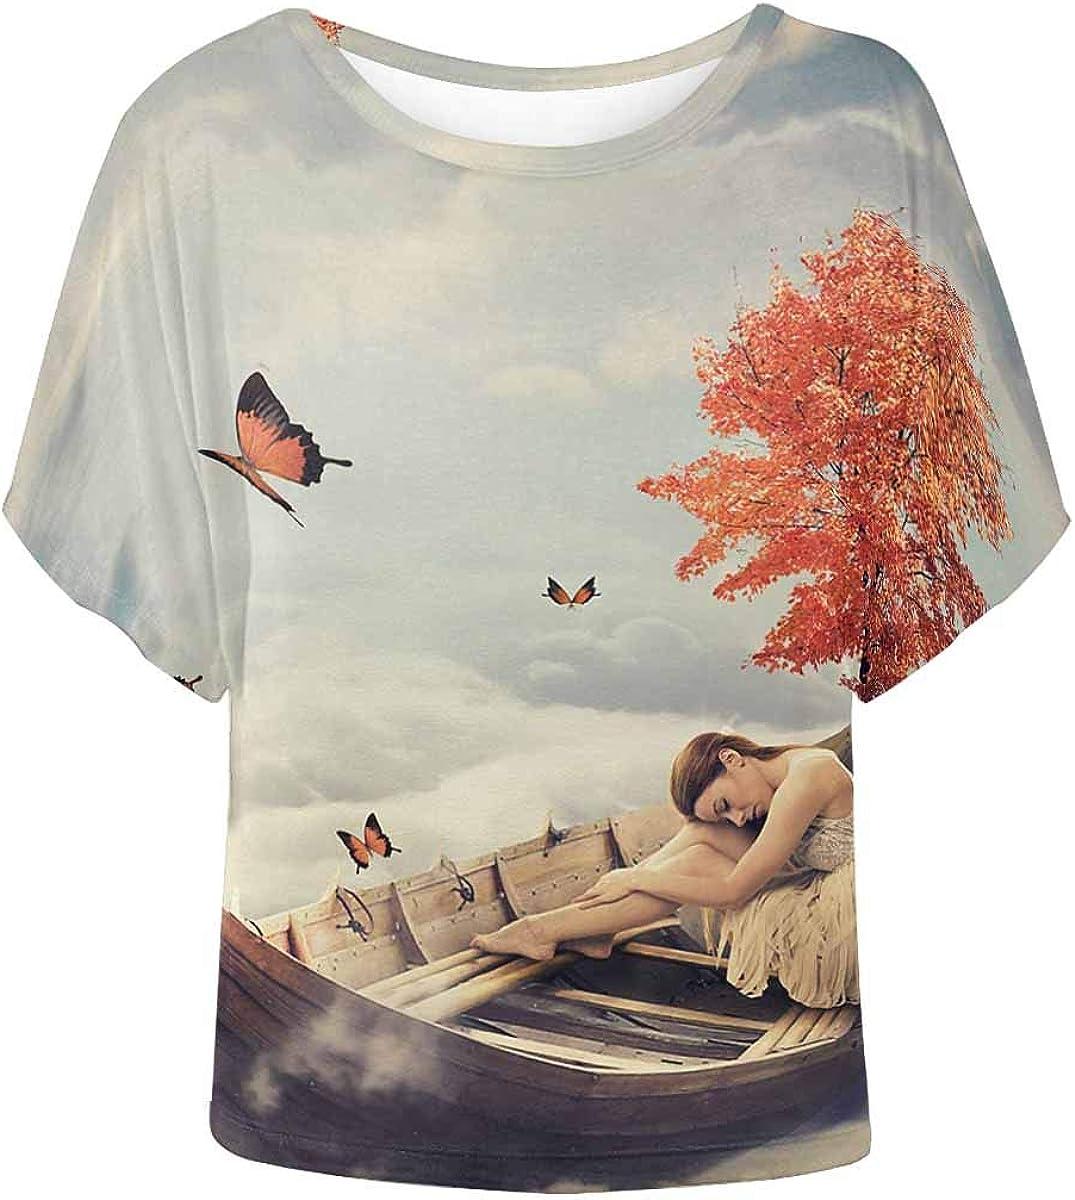 INTERESTPRINT Childs T-Shirt Bright Feathers Wonderful Print XS-XL